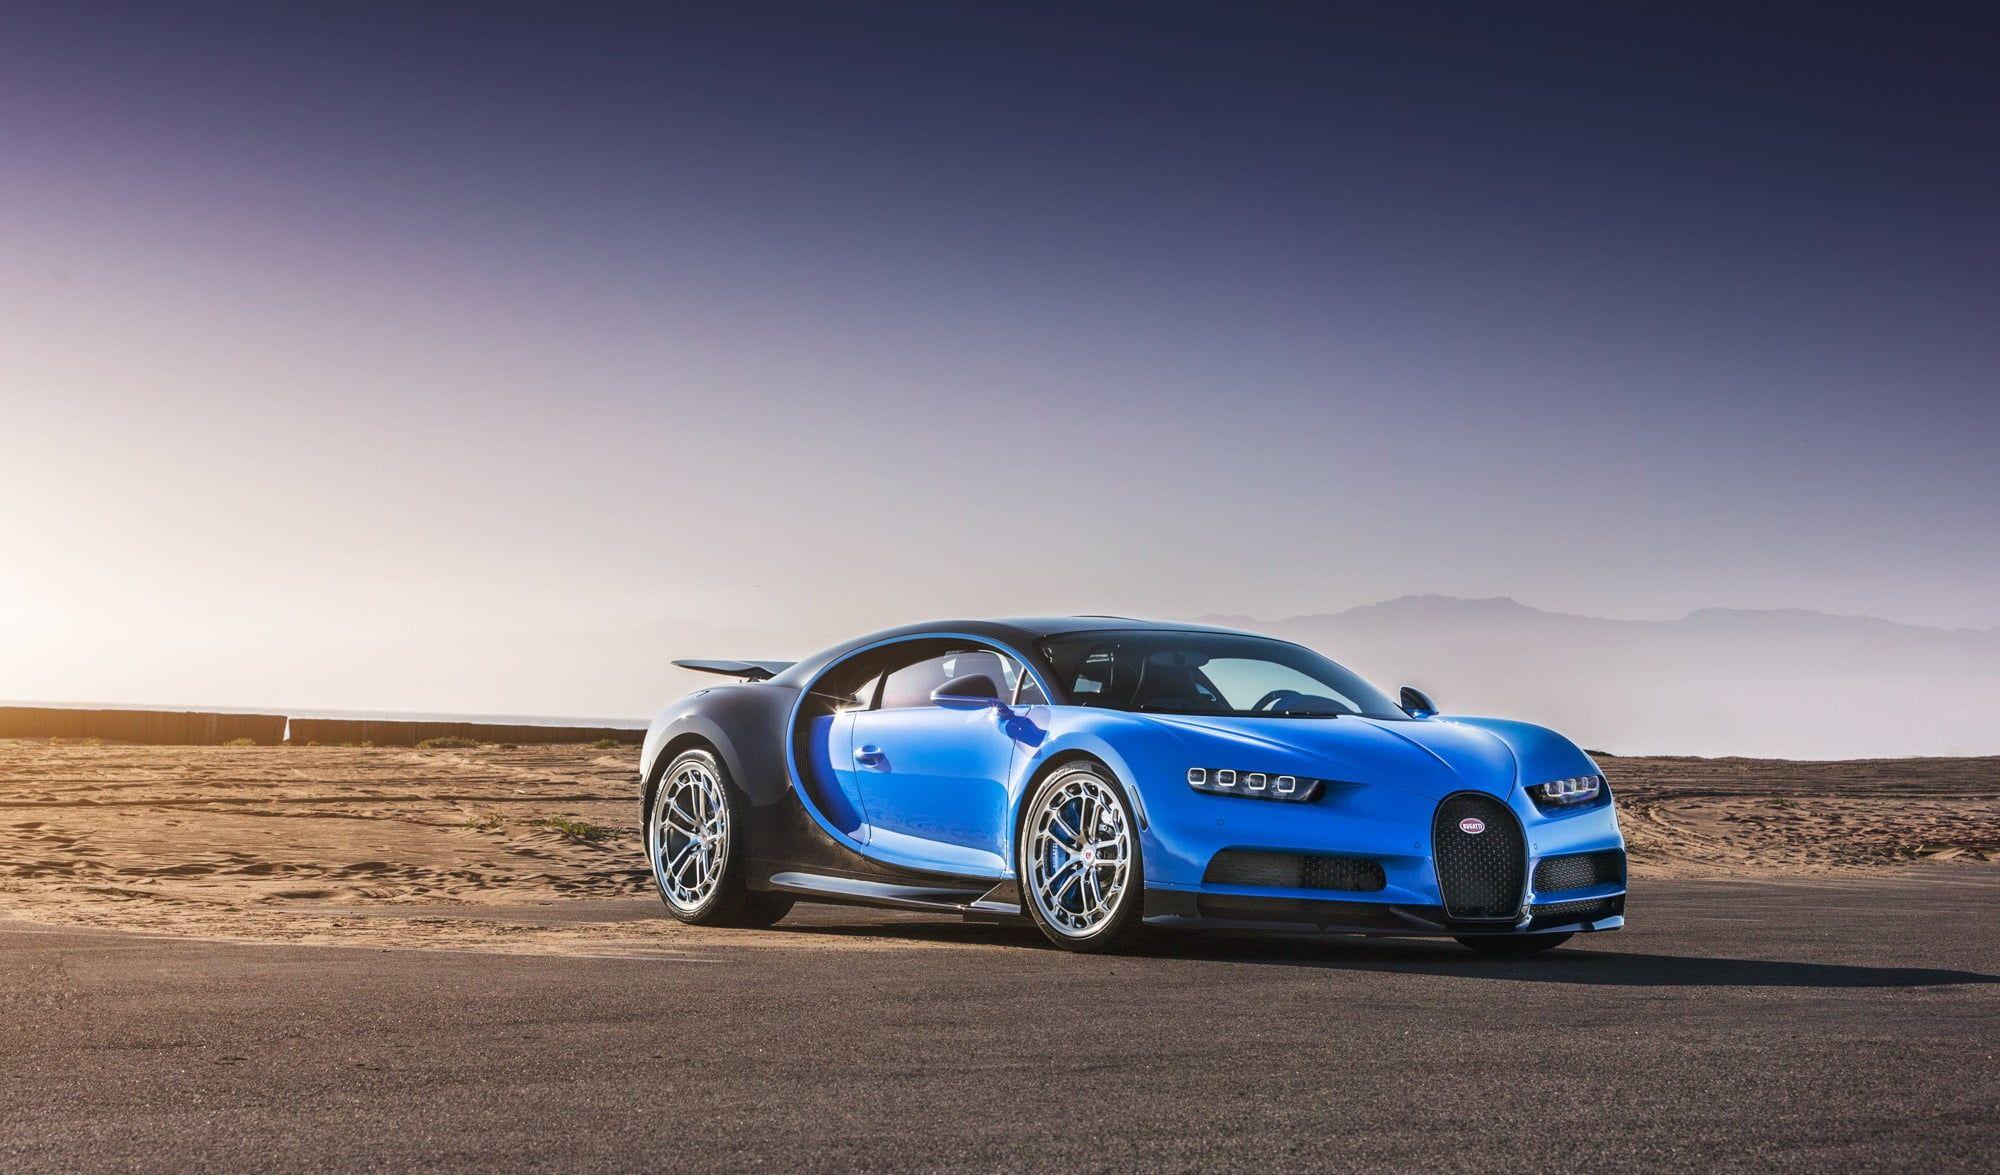 Pin By Selton Imbassahy On Lujss In 2021 Bugatti Blue Vossen